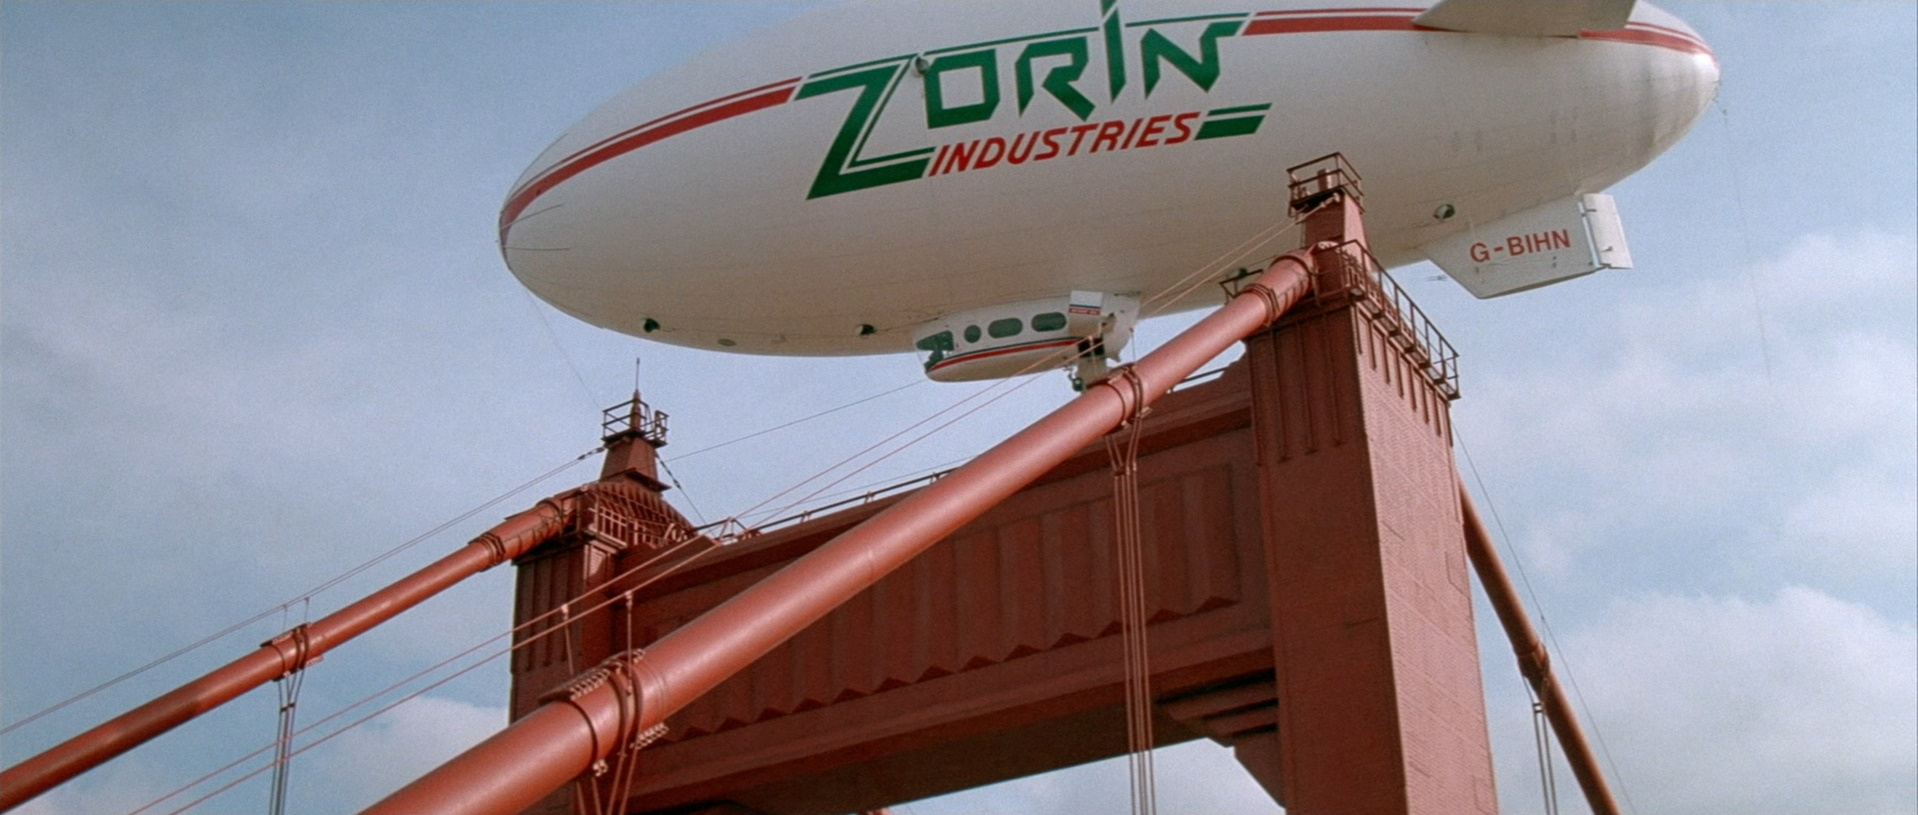 Zorin Industries Blimp